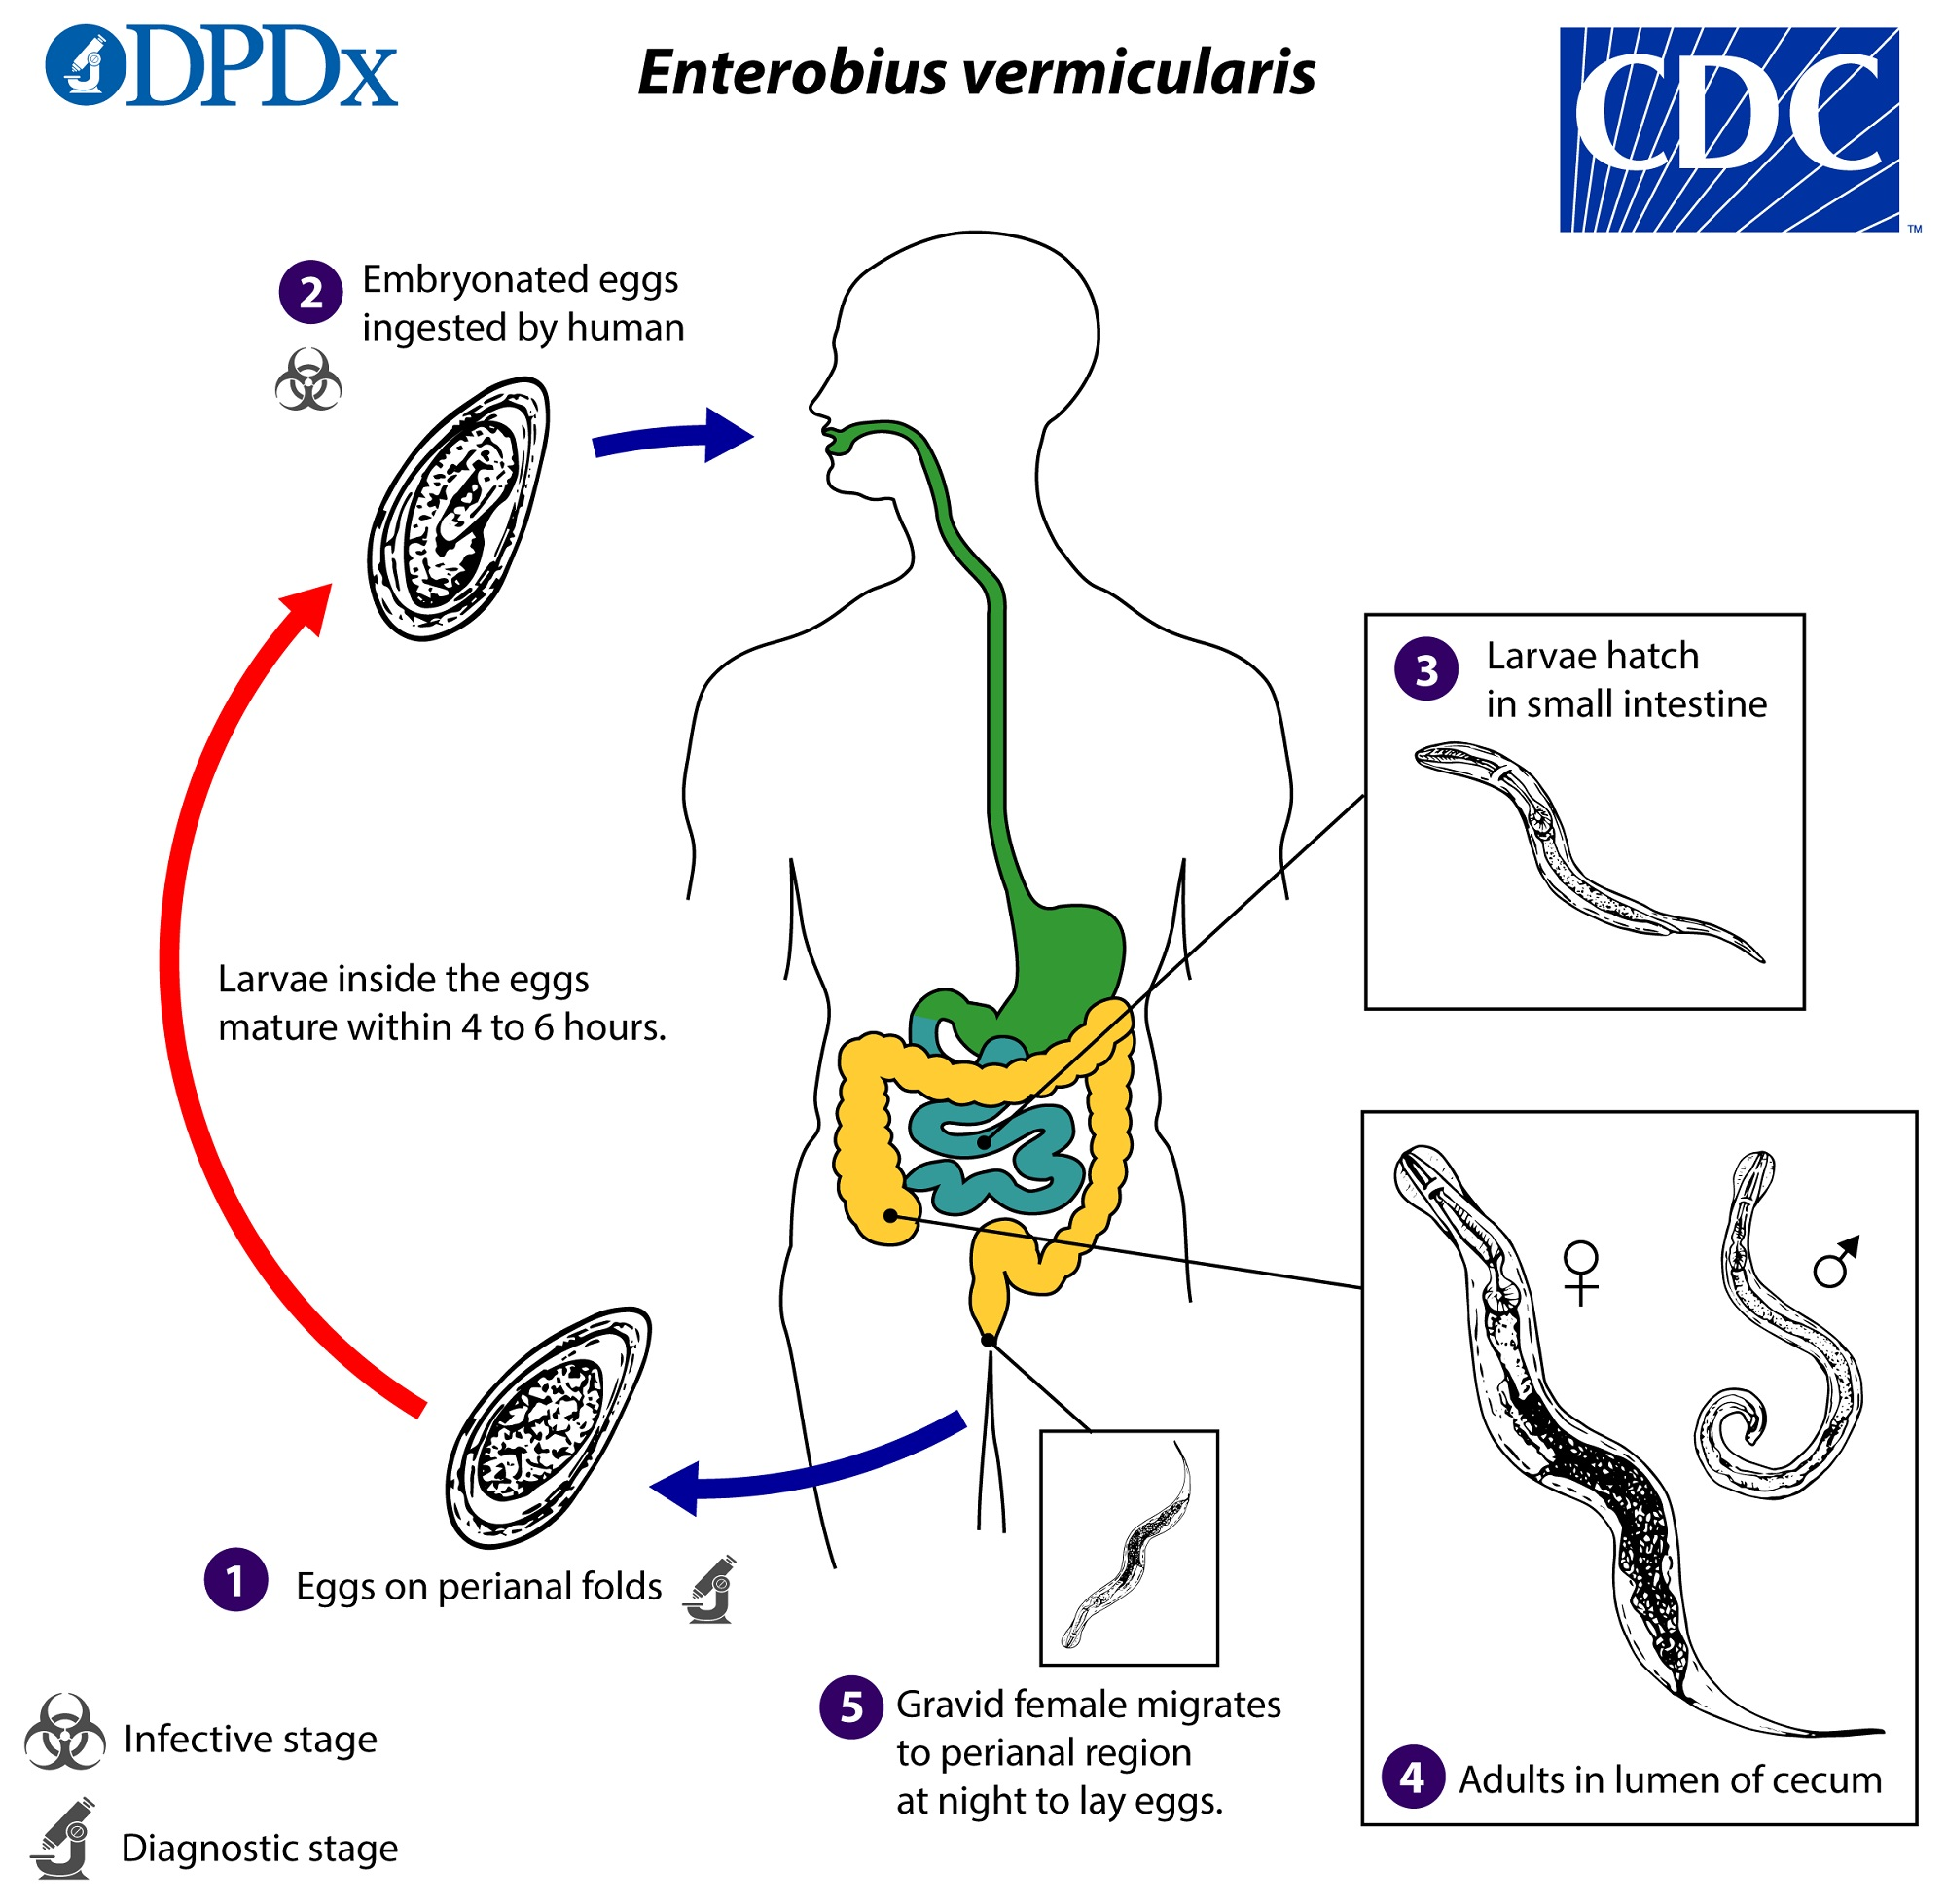 Enterobius vermicularis - Wikipedia